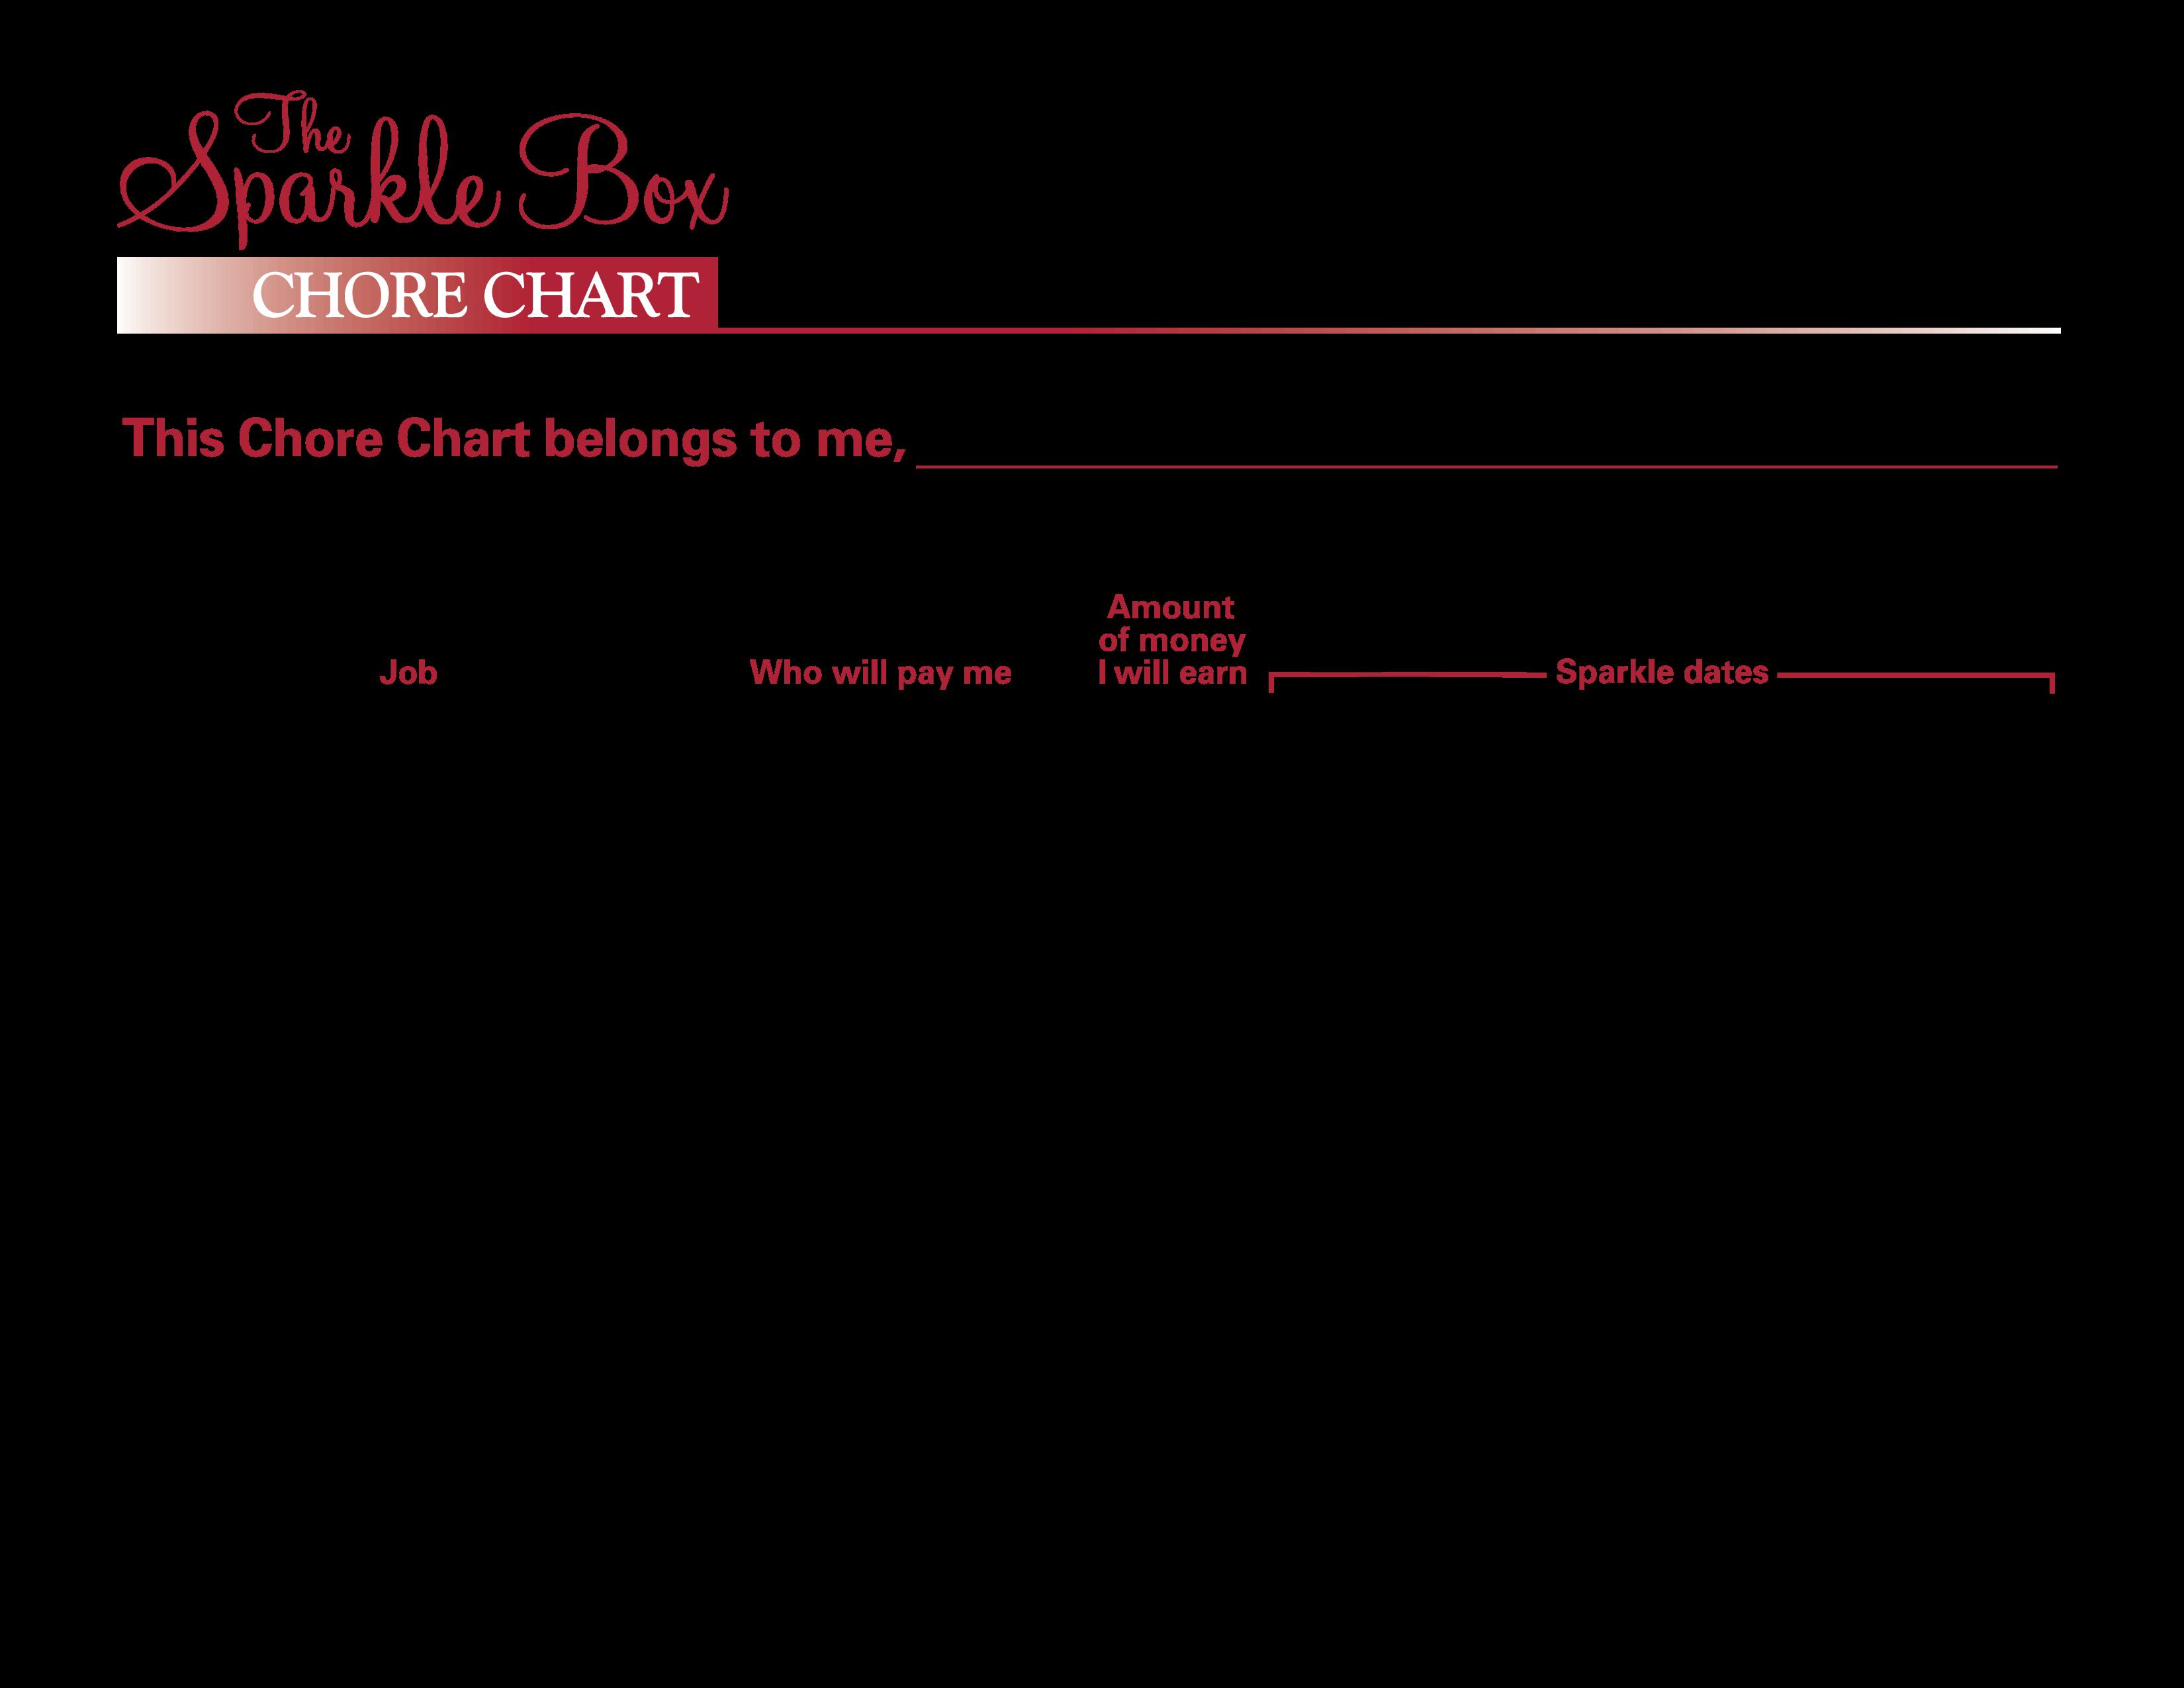 Free Blank Printable Chore Chart Templates at allbusinesstemplatescom